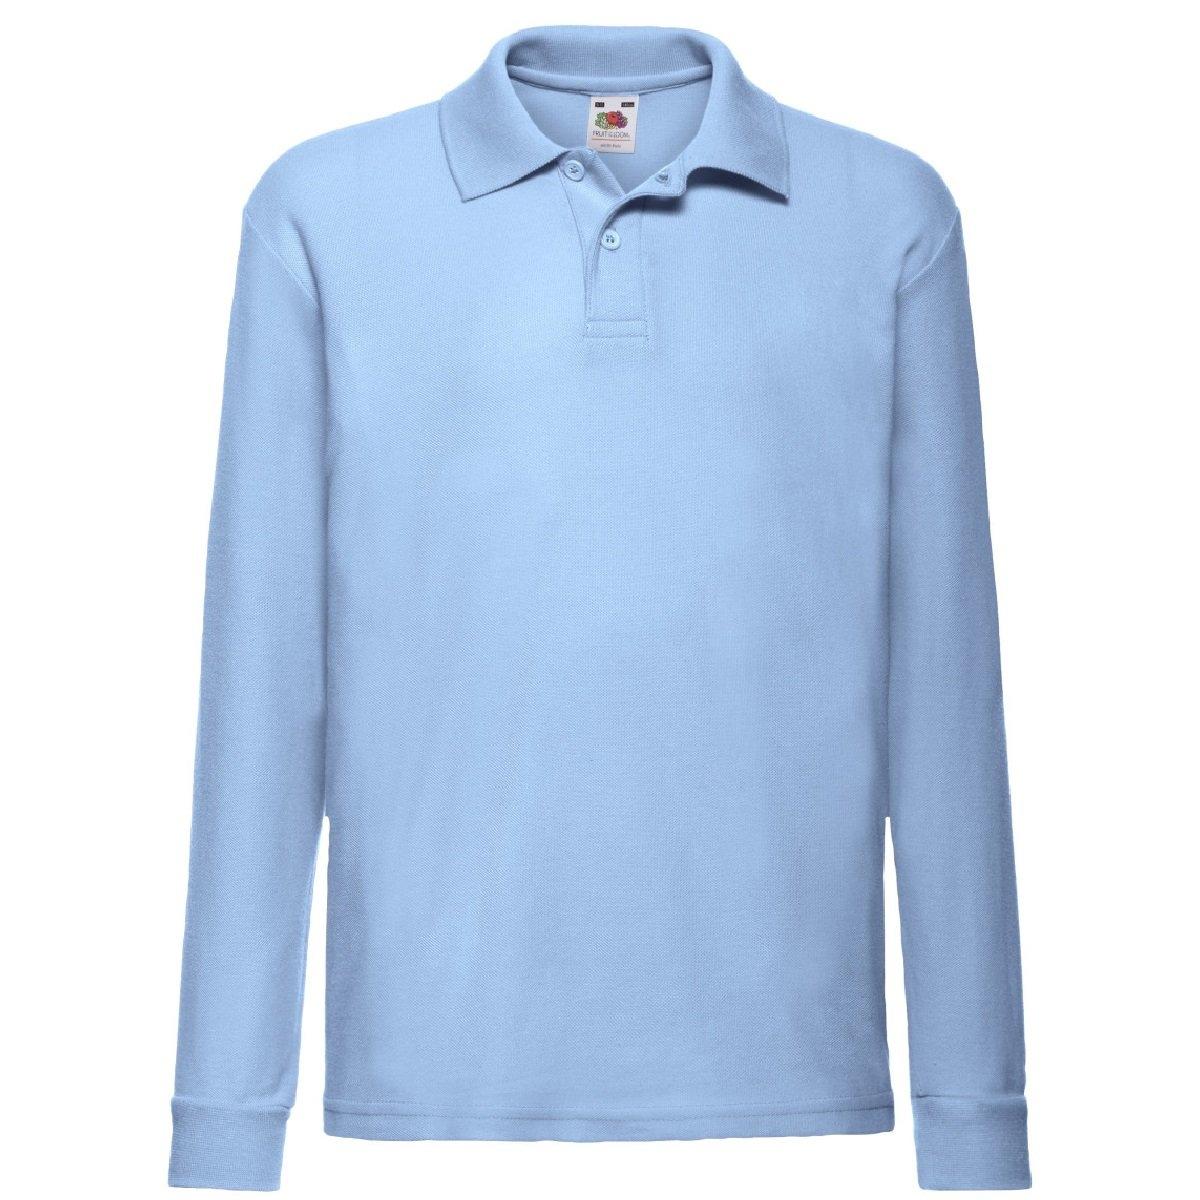 Fruit of the Loom poloshirt »Kinder Polo Shirt, Langarm« voordelig en veilig online kopen